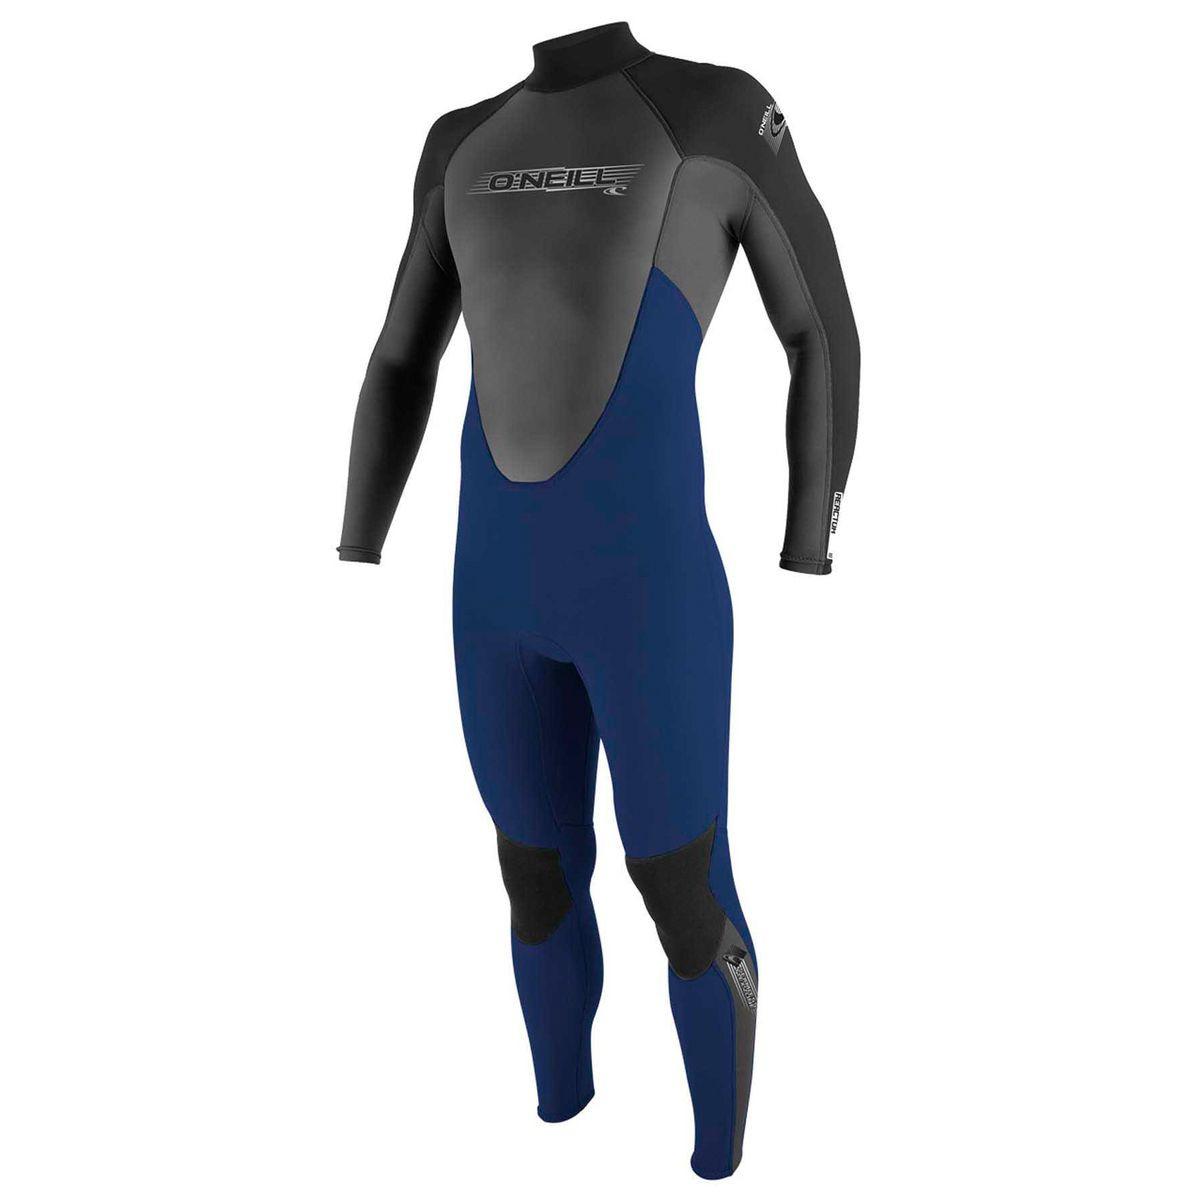 O'Neill Reactor 3/2mm Back Zip Wetsuit - Navy/ Graphite/ Black